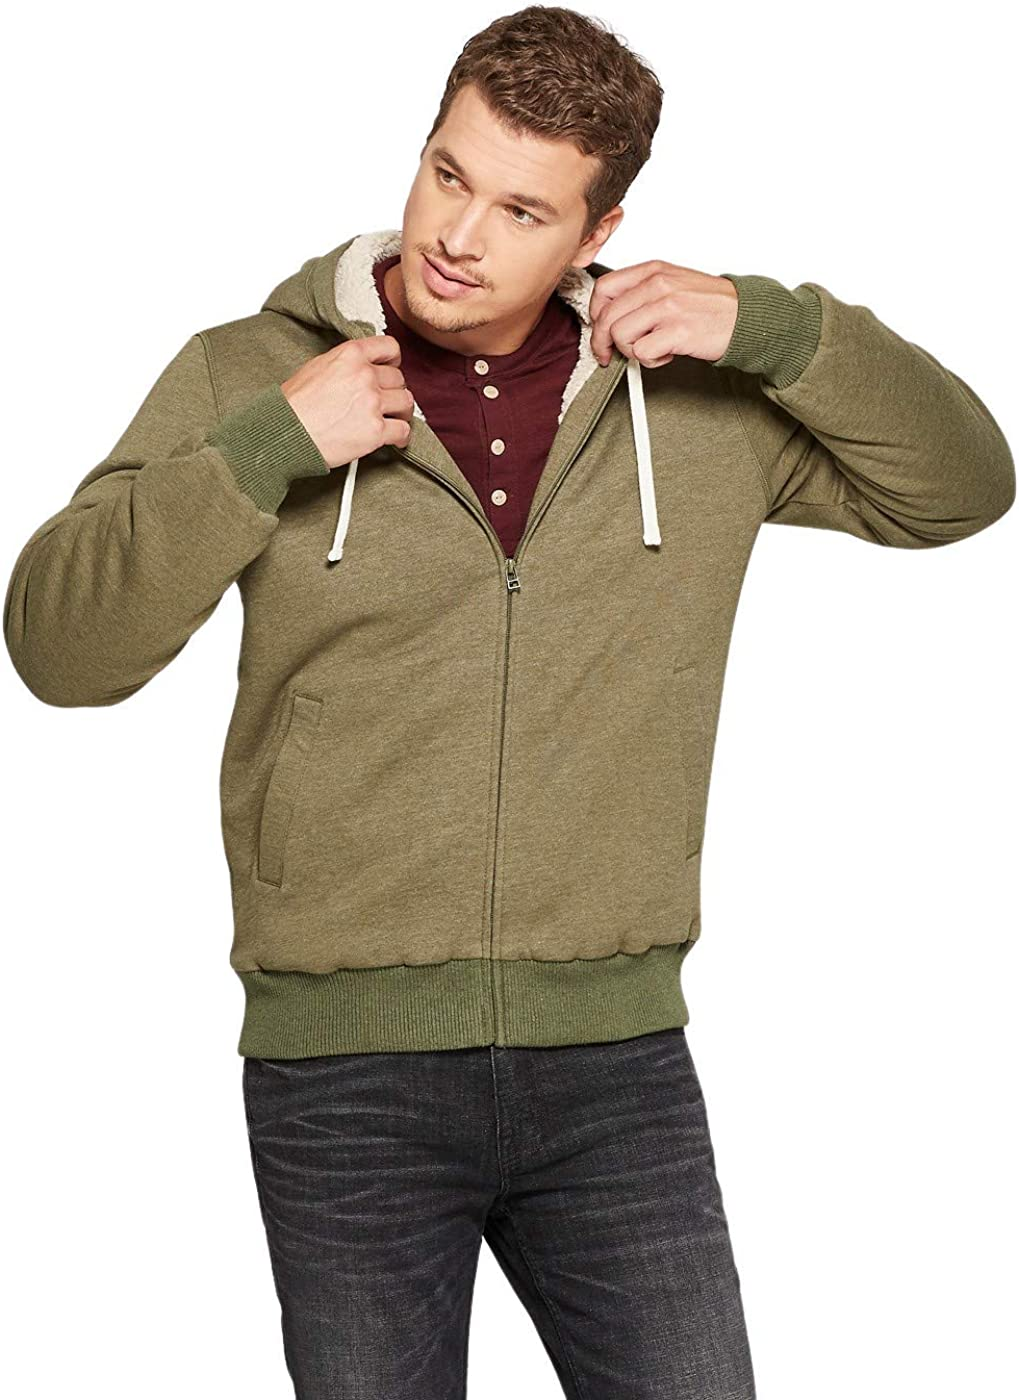 Goodfellow & Co Men's Sherpa Fleece Jacket, XL, Green